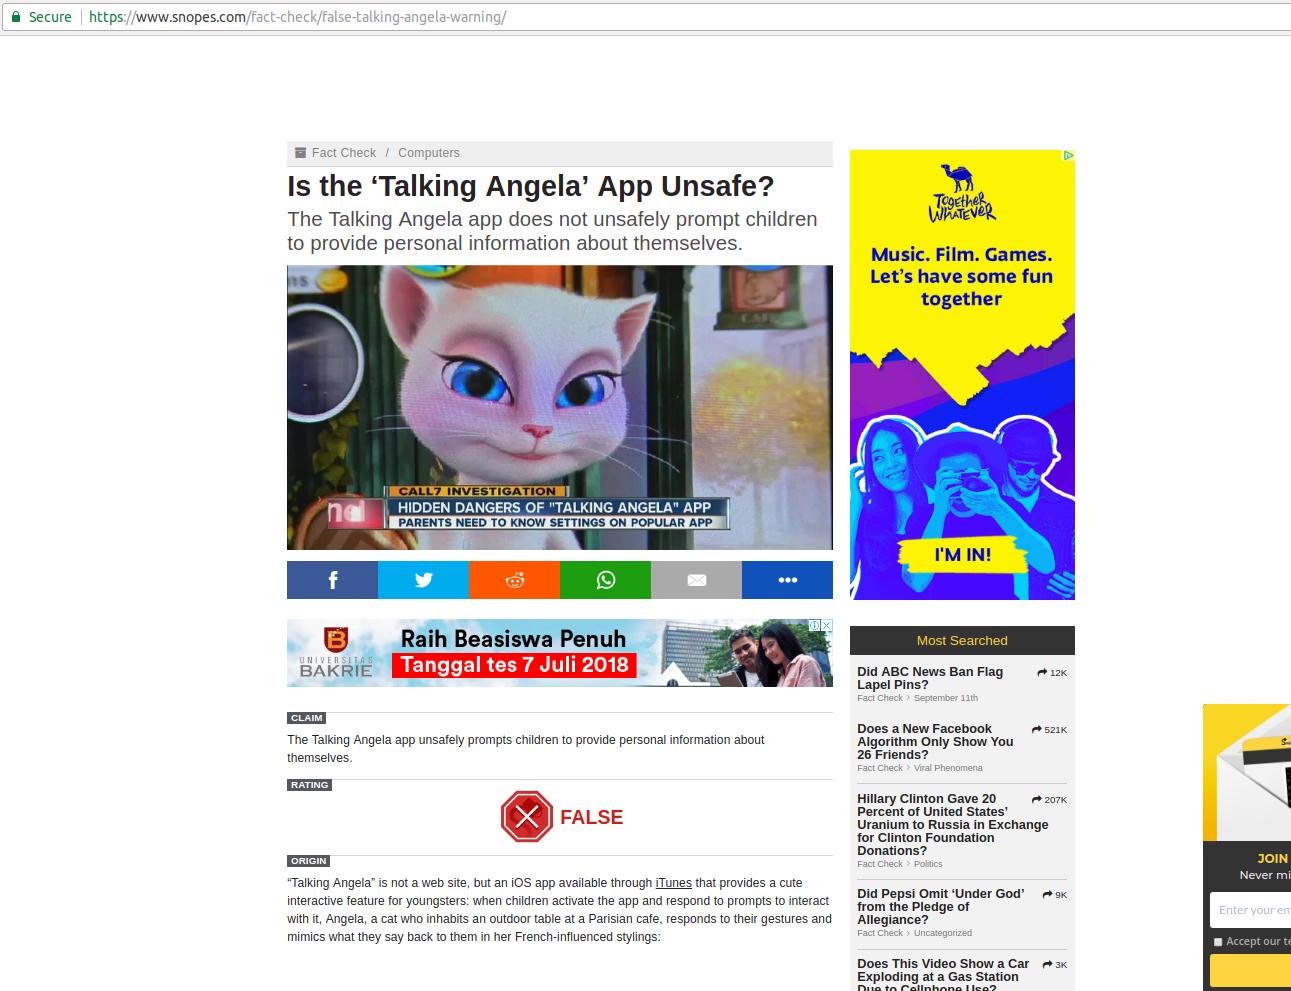 SALAH] Aplikasi Game Talking Angela Berbahaya Khususnya